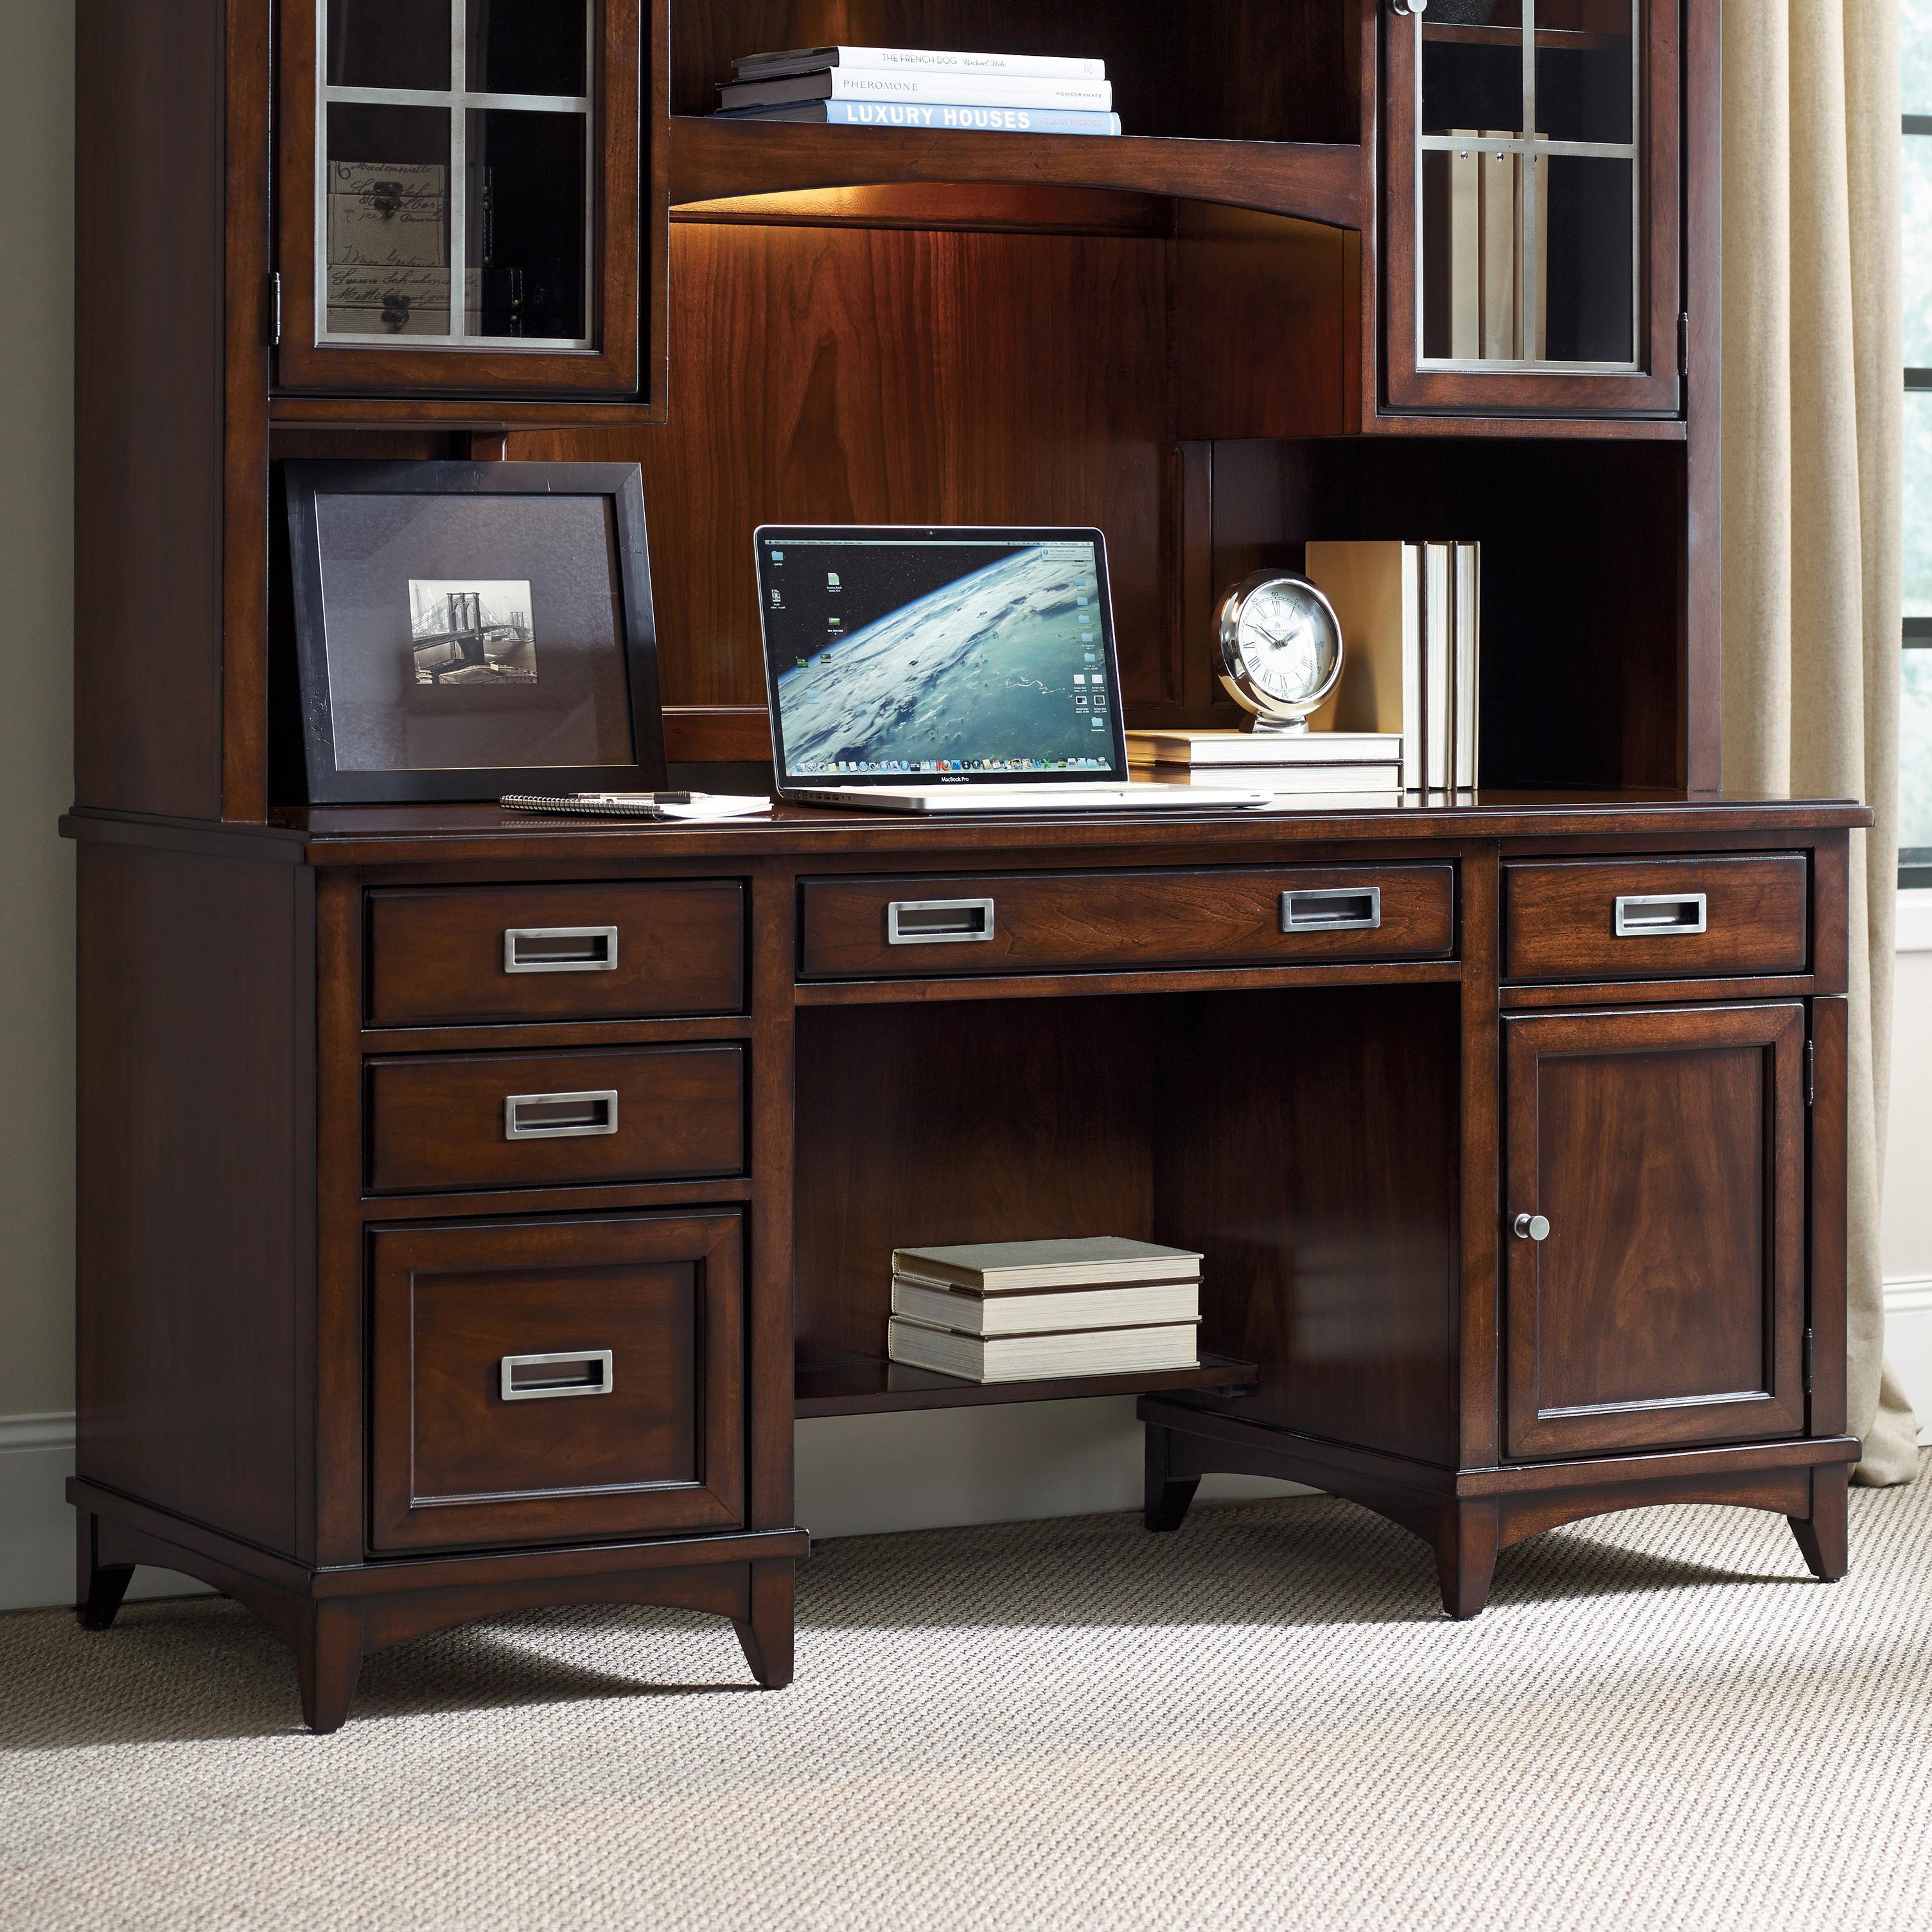 Walnut Computer Credenza by Hooker Furniture | Wolf and Gardiner ...